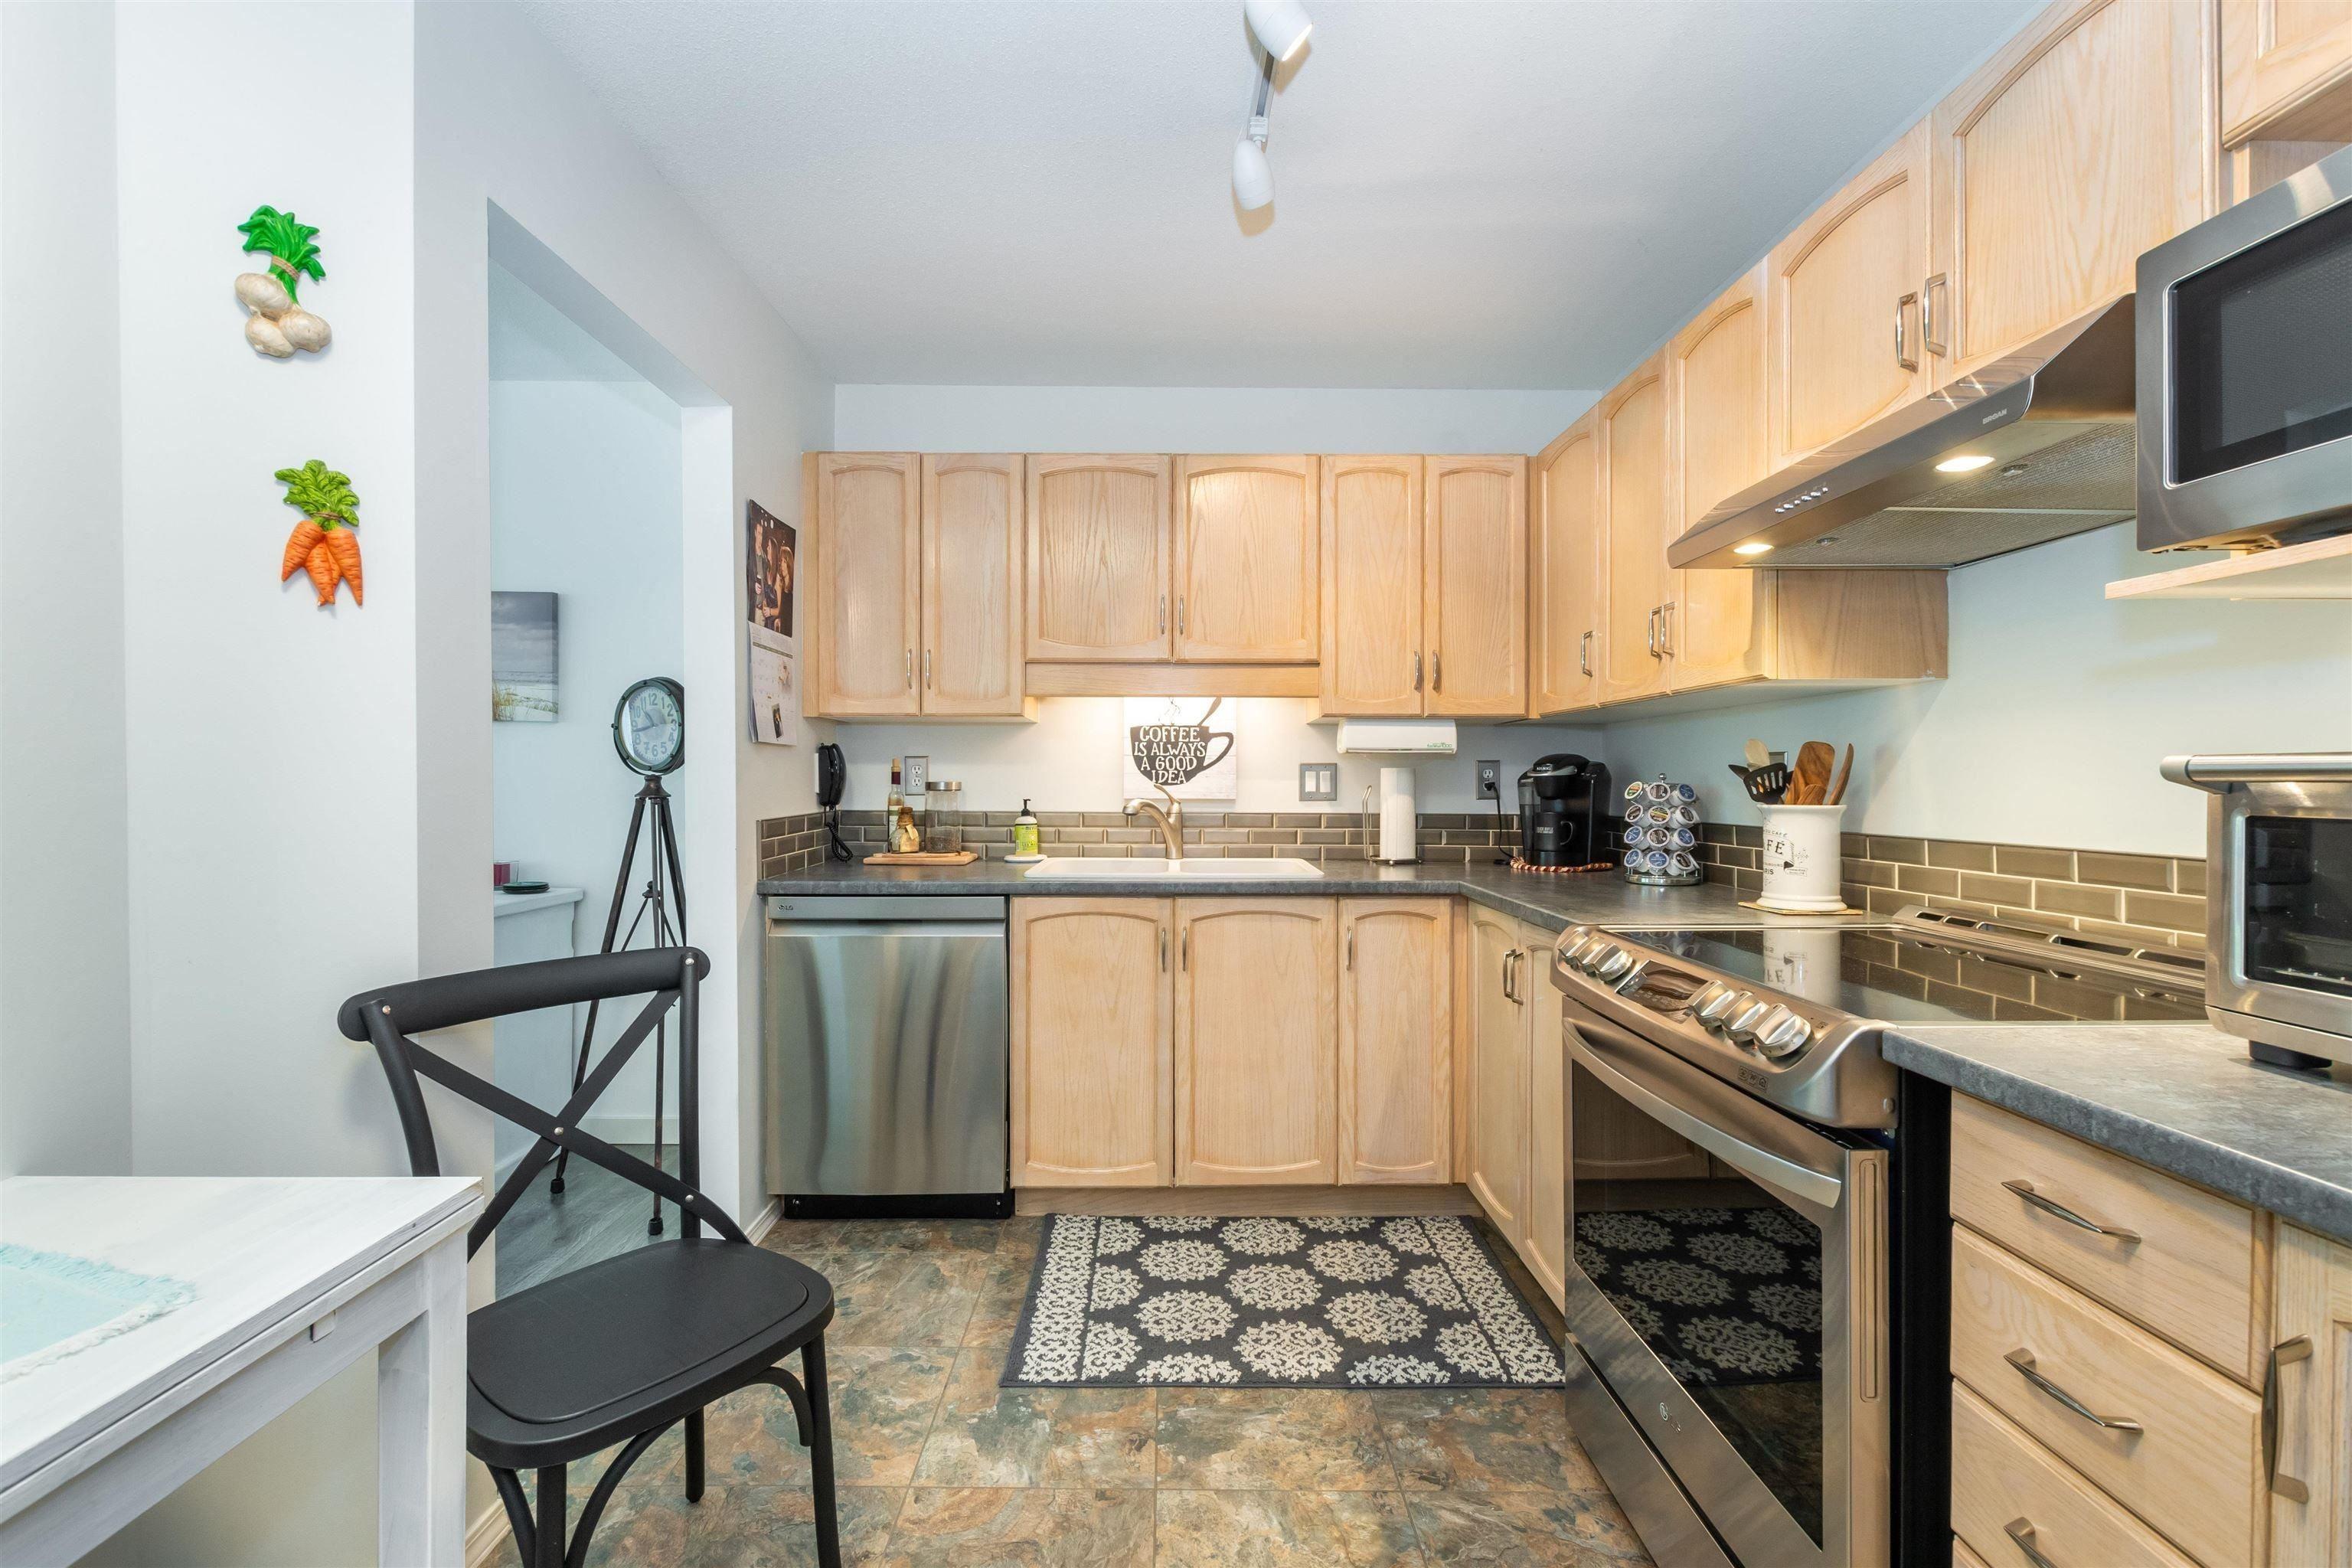 303 170 CEDAR AVENUE - Harrison Hot Springs Apartment/Condo for sale, 2 Bedrooms (R2627829) - #1